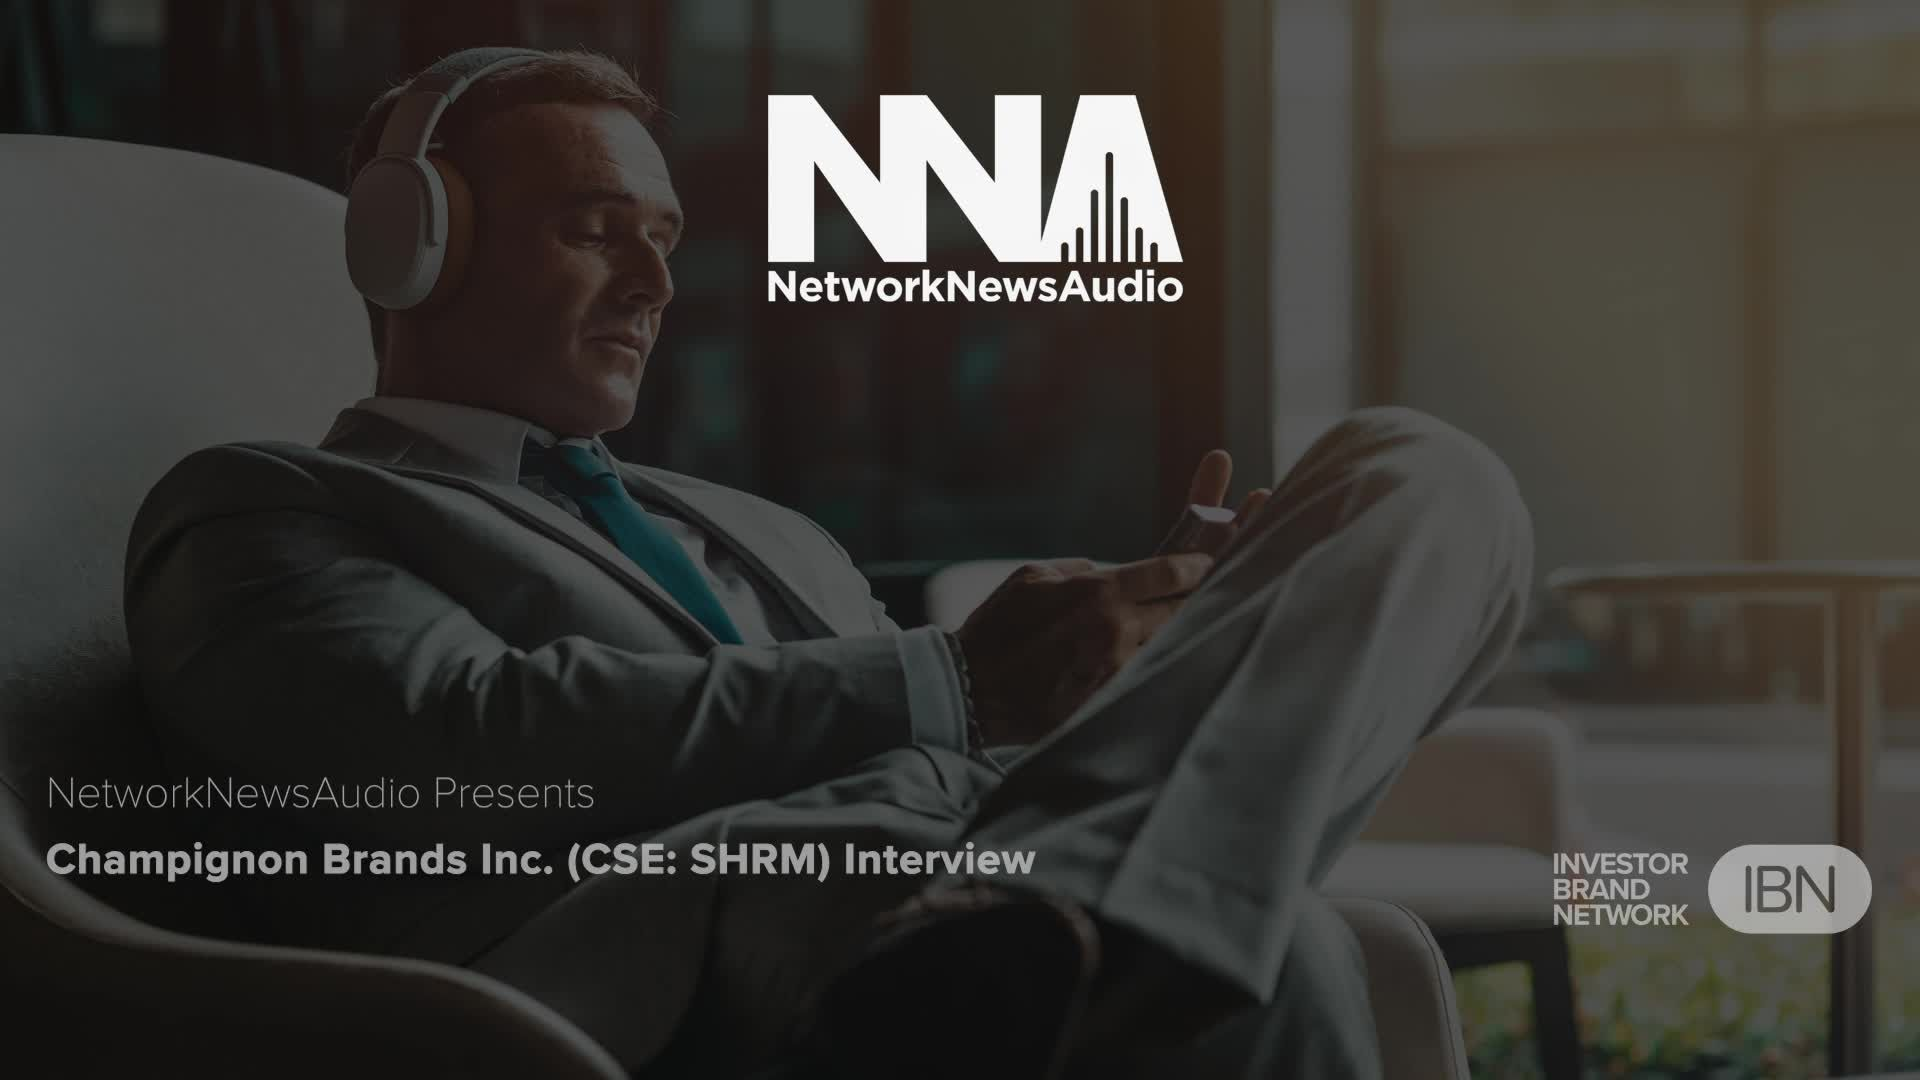 Champignon Brands Inc. (CSE: SHRM) (OTCQB: SHRMF) (FWB: 496) Interview